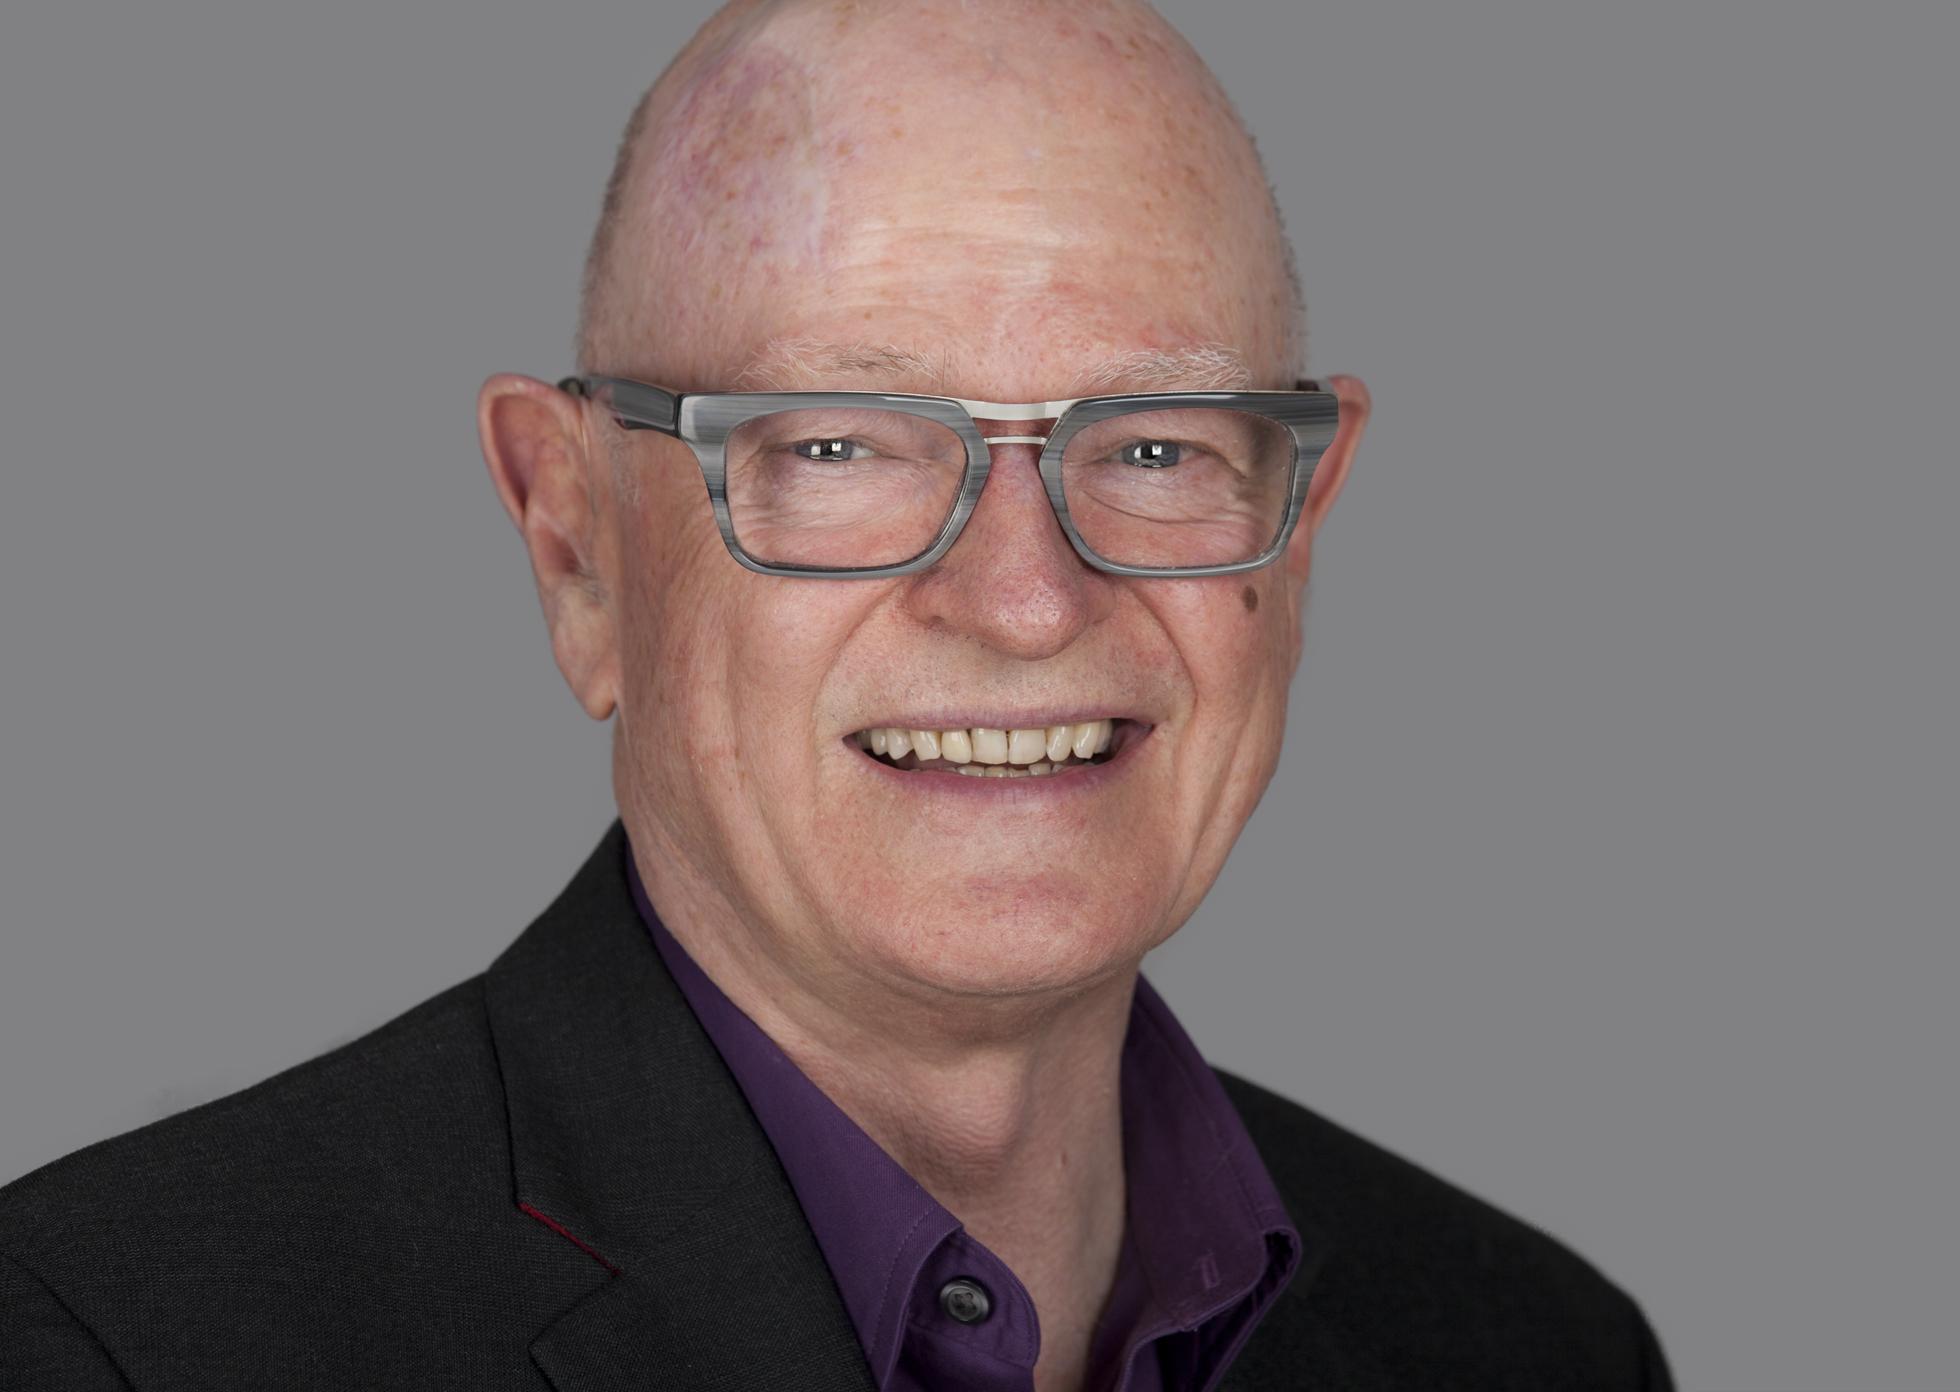 Dr Geoff Crinean